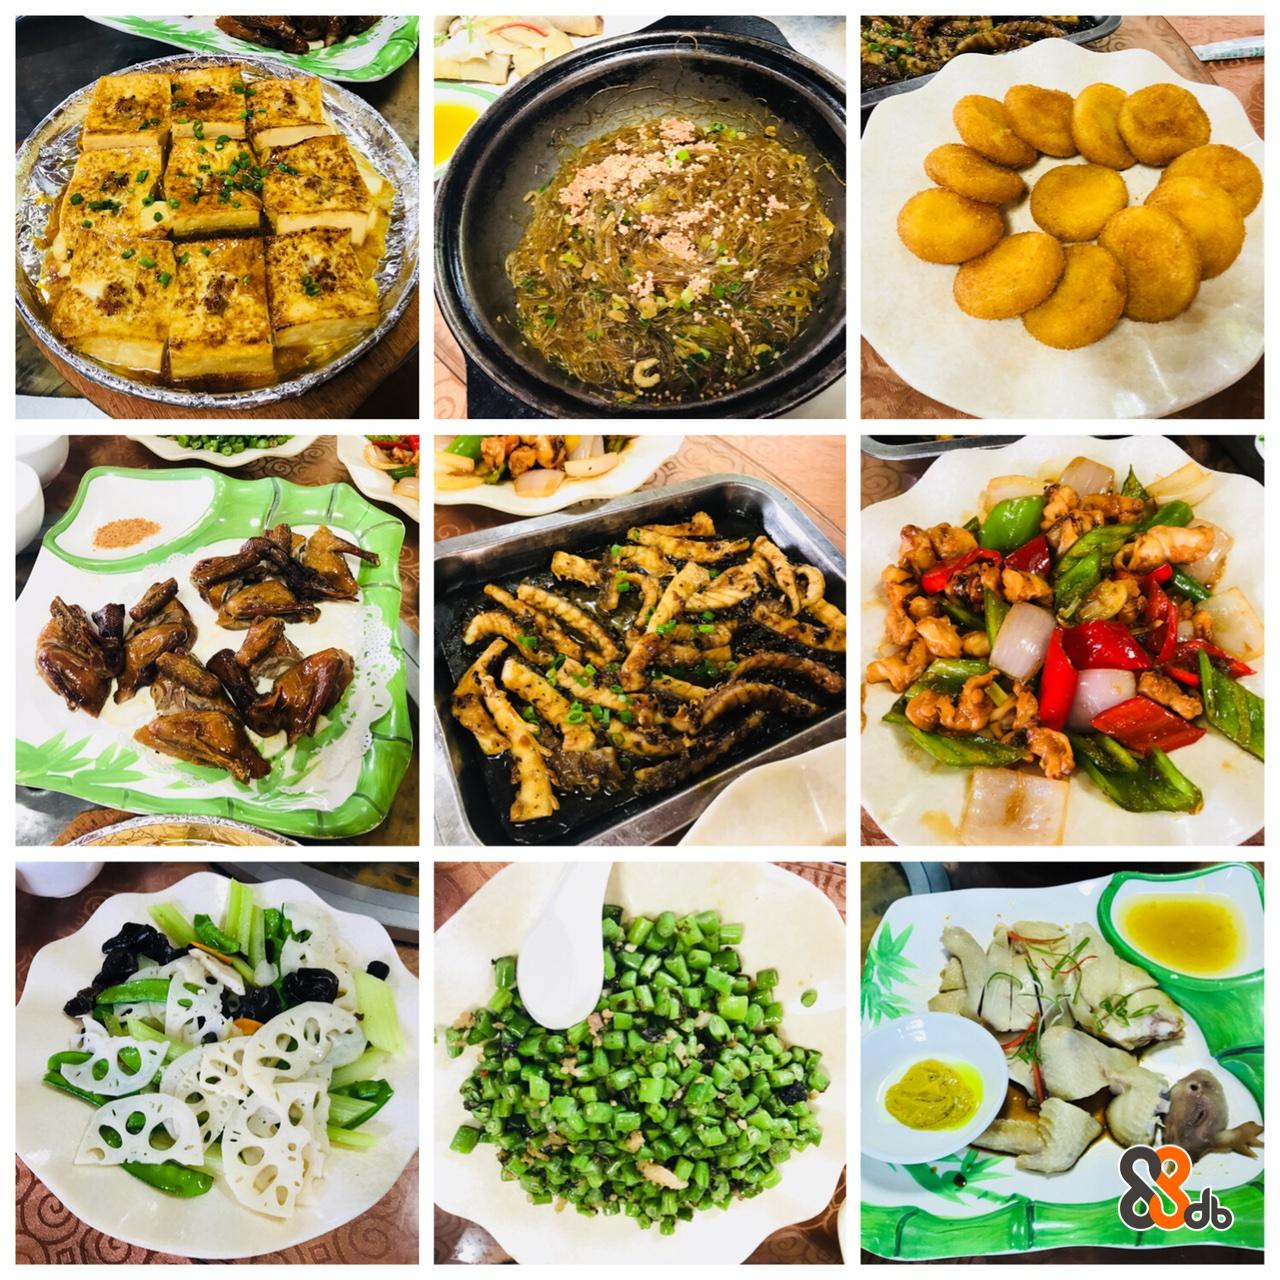 food,dish,meal,cuisine,vegetarian food